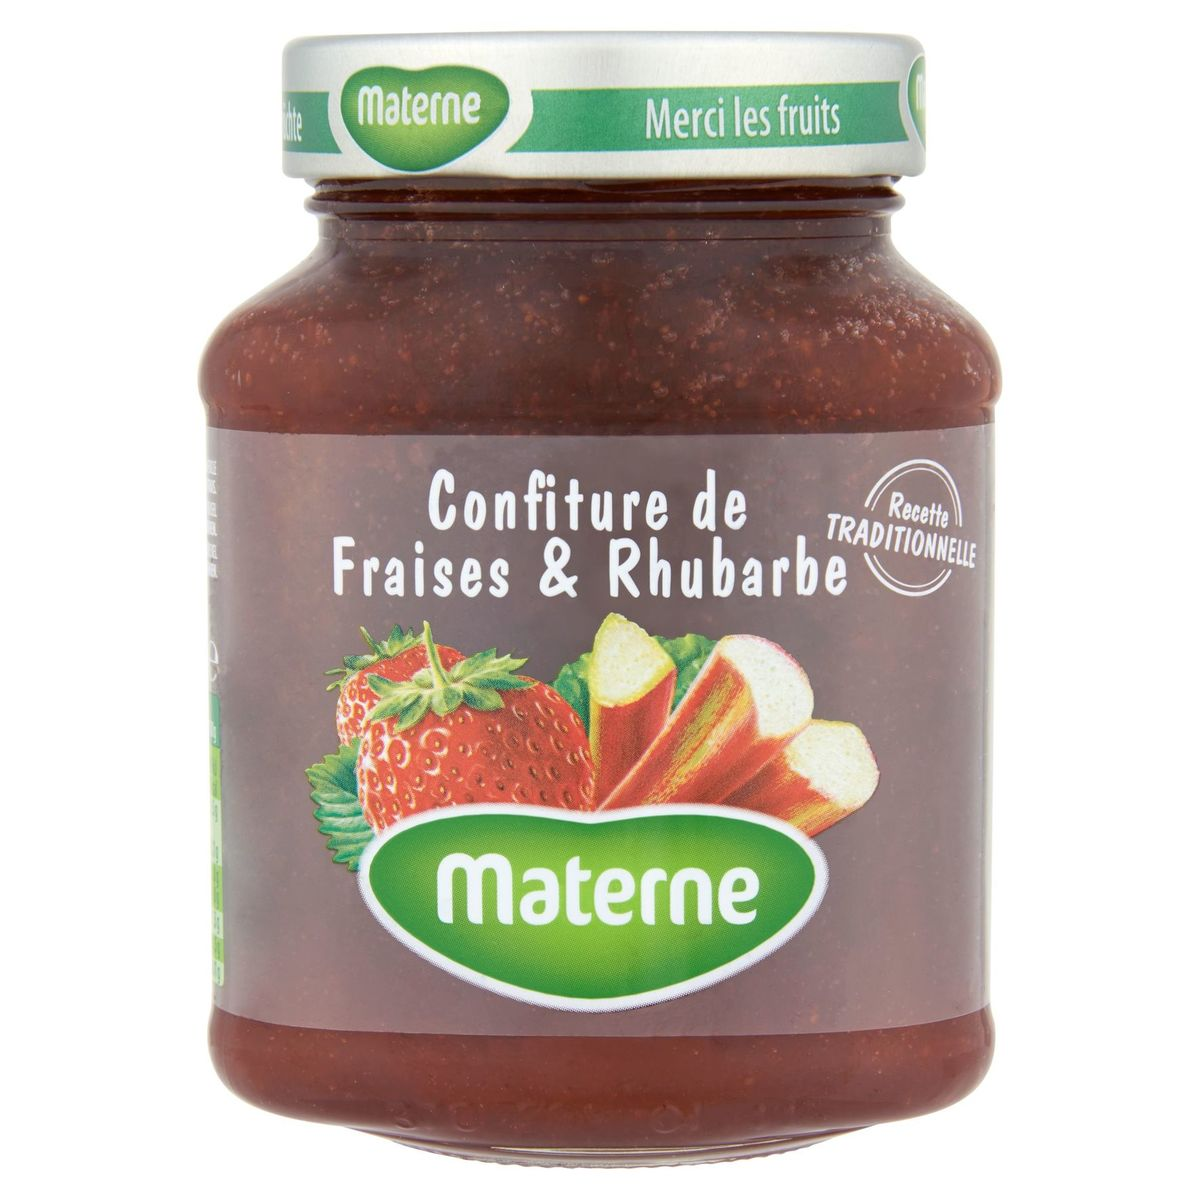 Materne Aardbeien Rabarberconfituur 450 g